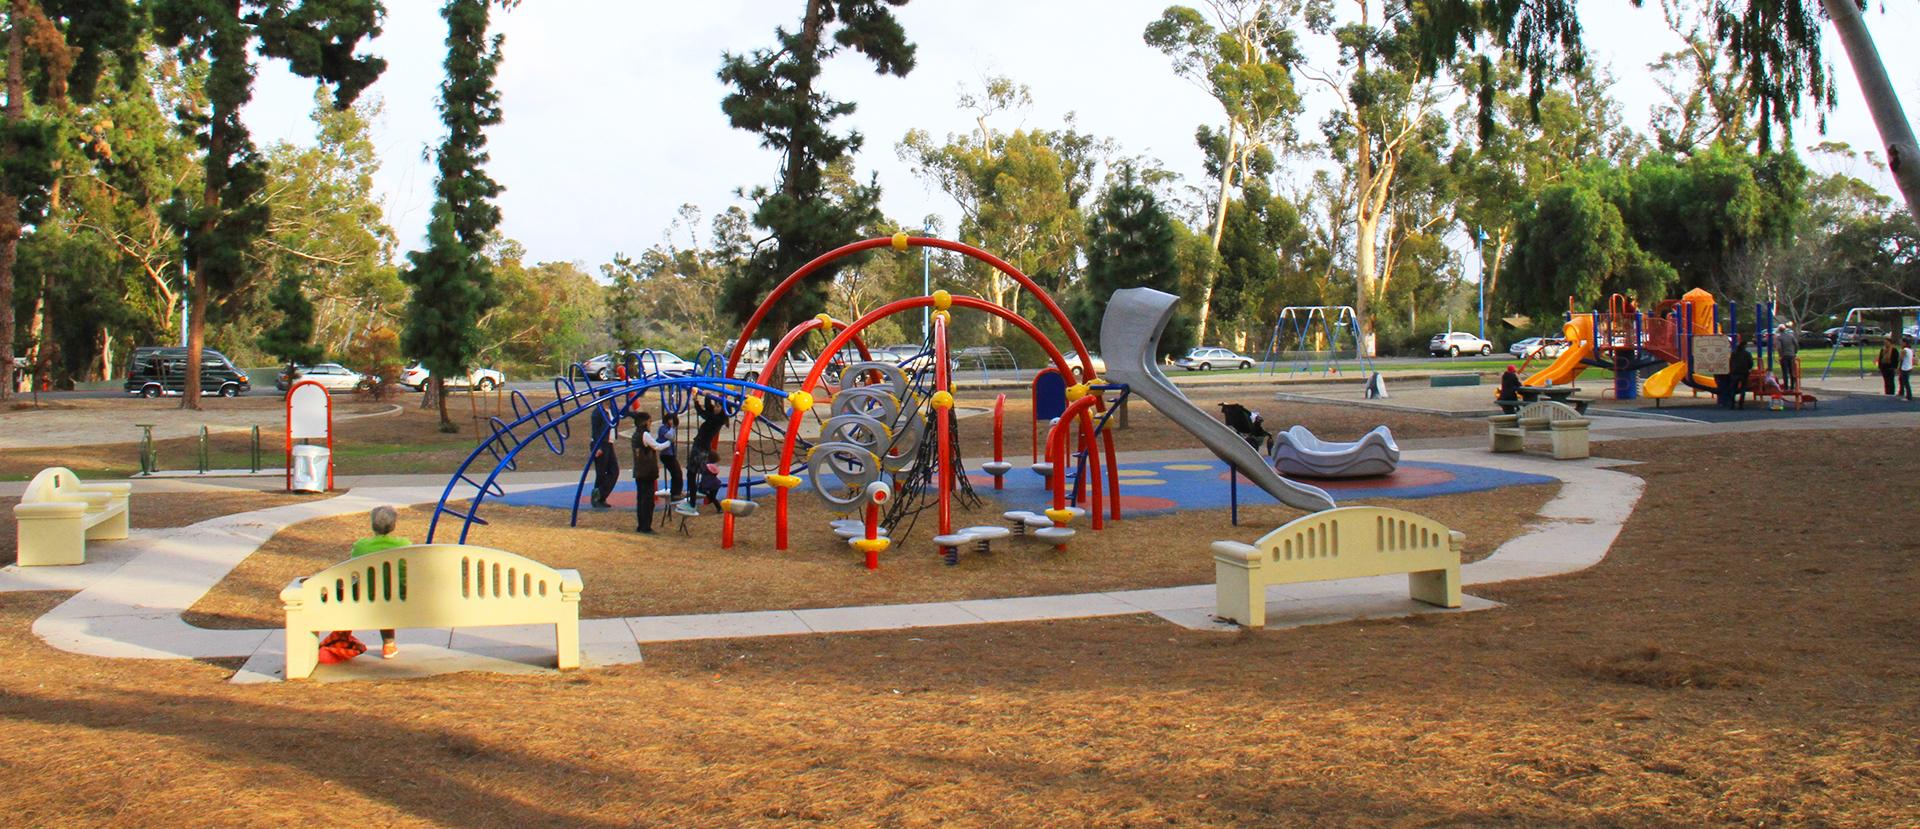 Parks in Balboa Park